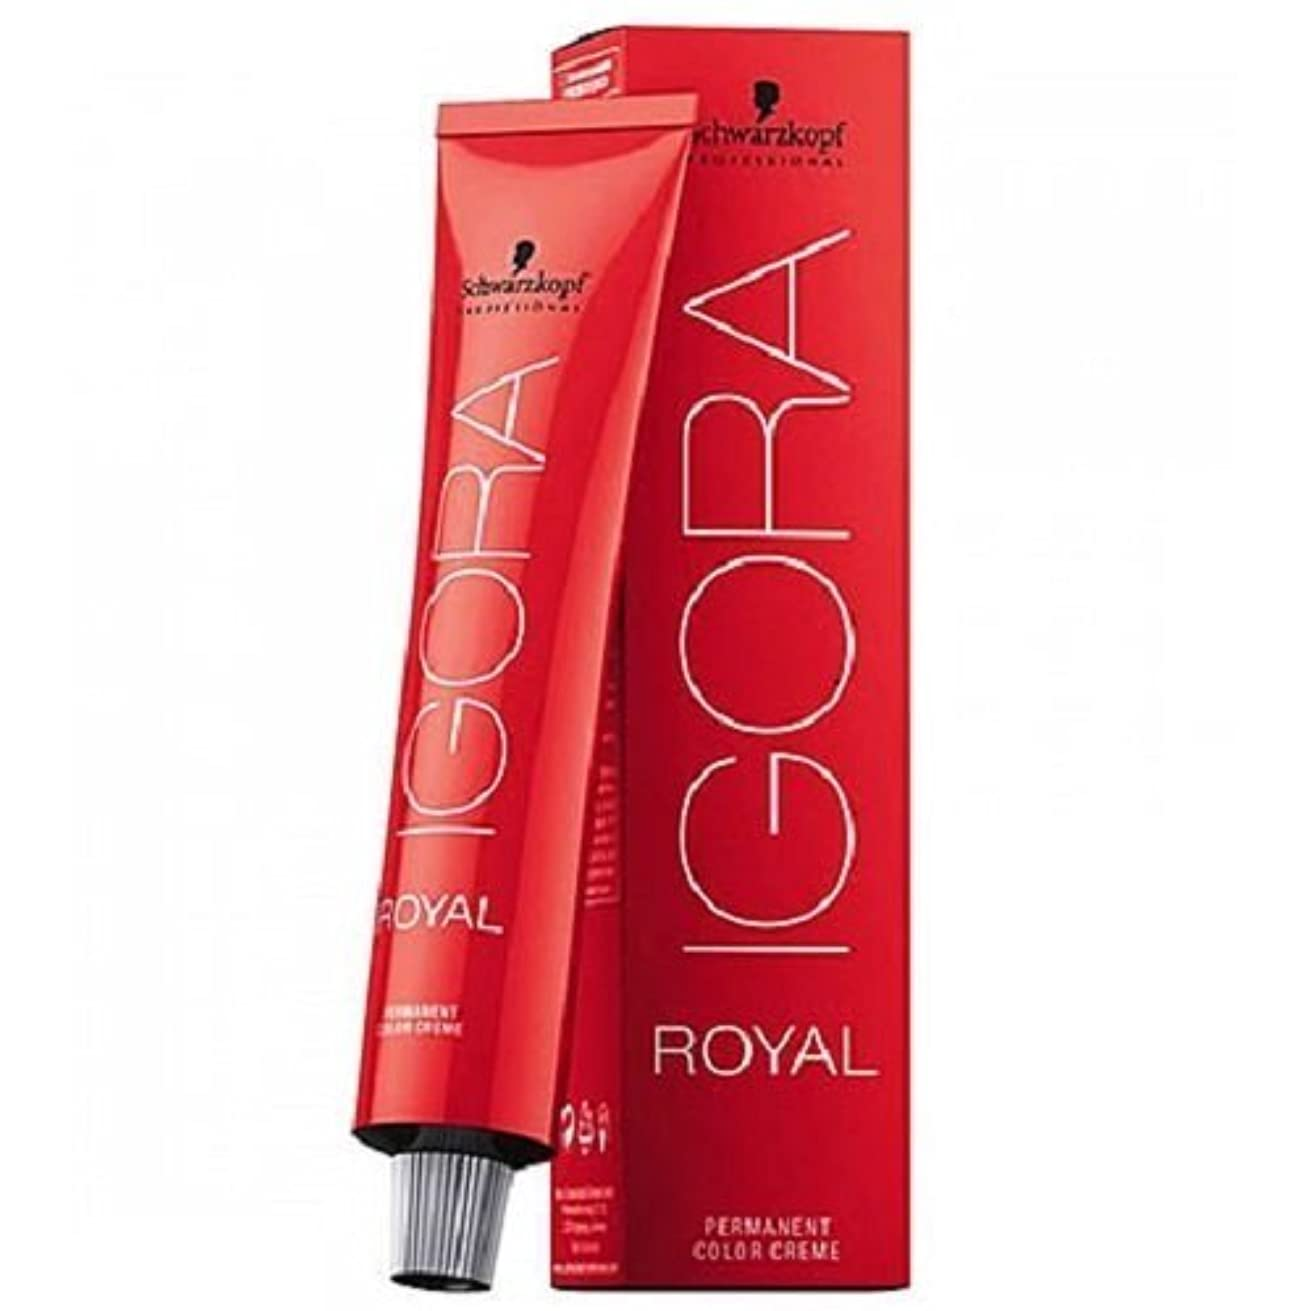 Schwarzkopf Igora Royal Permanent Hair Color - 6-12 Dark Blonde Cendre Ash